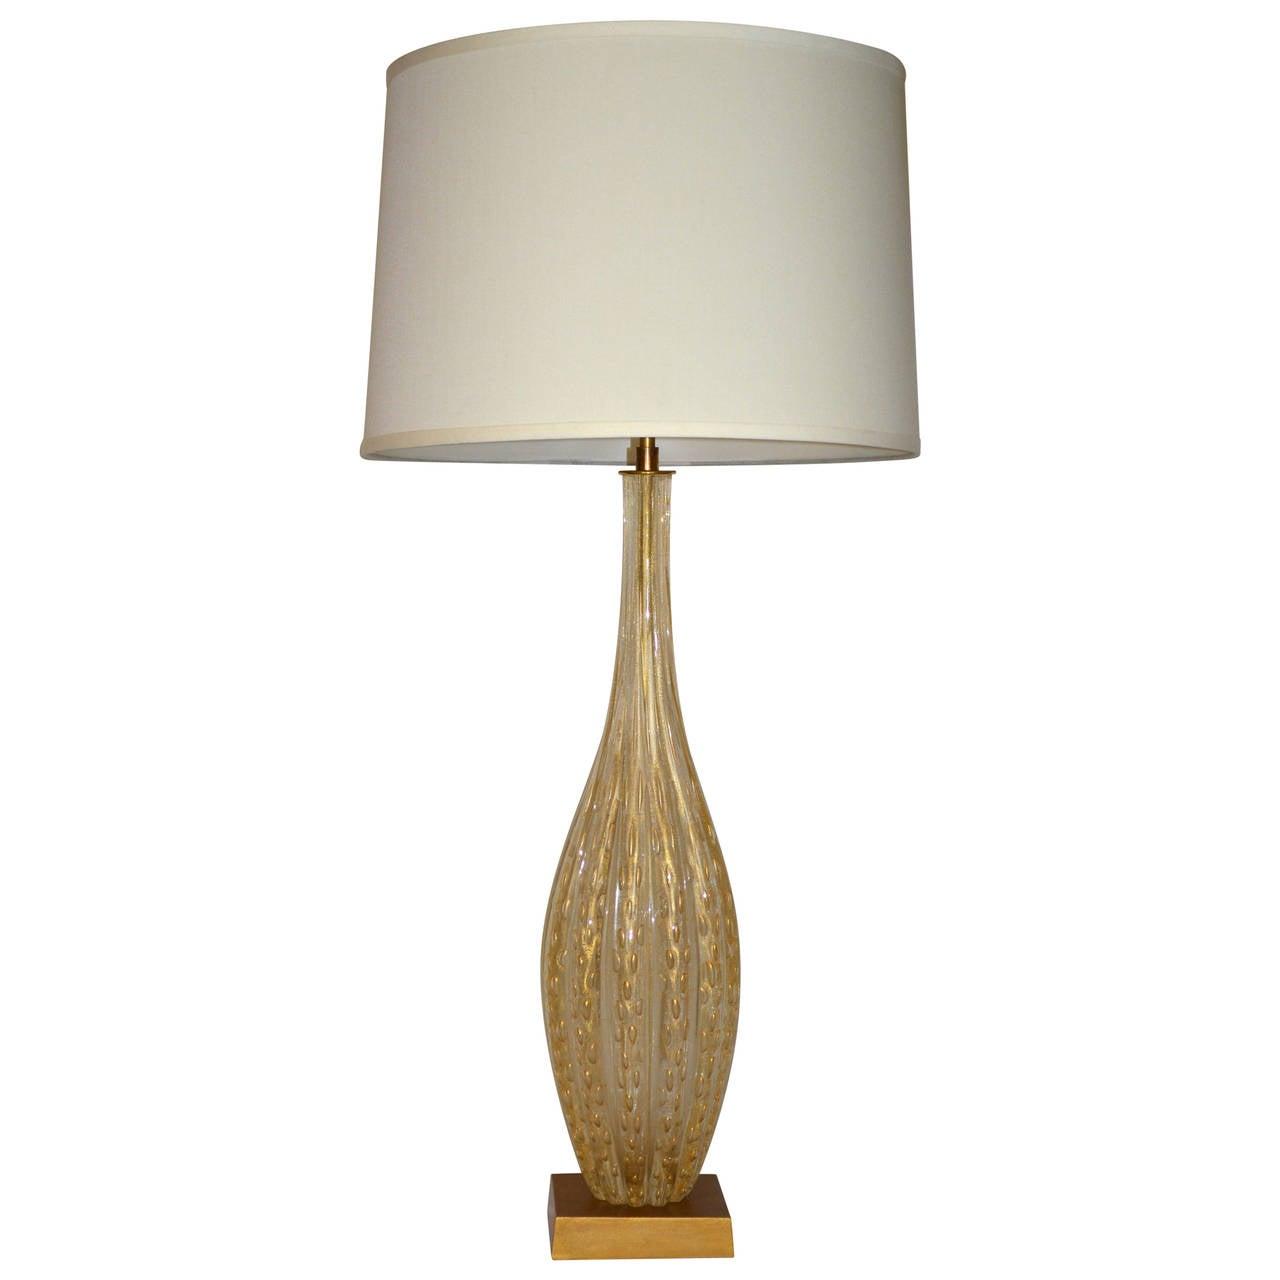 Mid-Century Barovier e Toso Fluted Murano Lamp